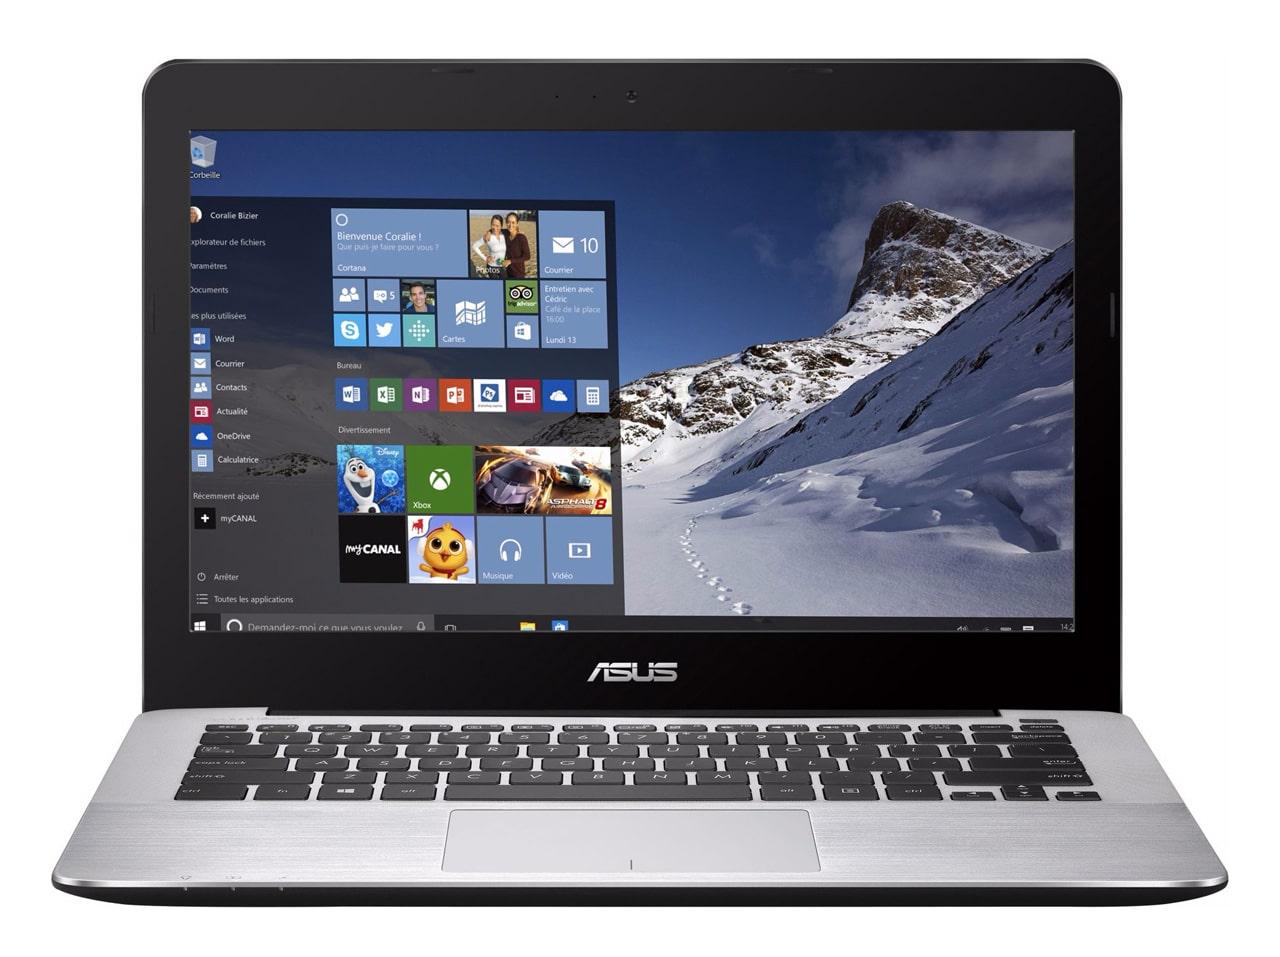 Asus R301UA-FN137T promo 549€, ultraportable 13 pouces mat SSD i5 argent